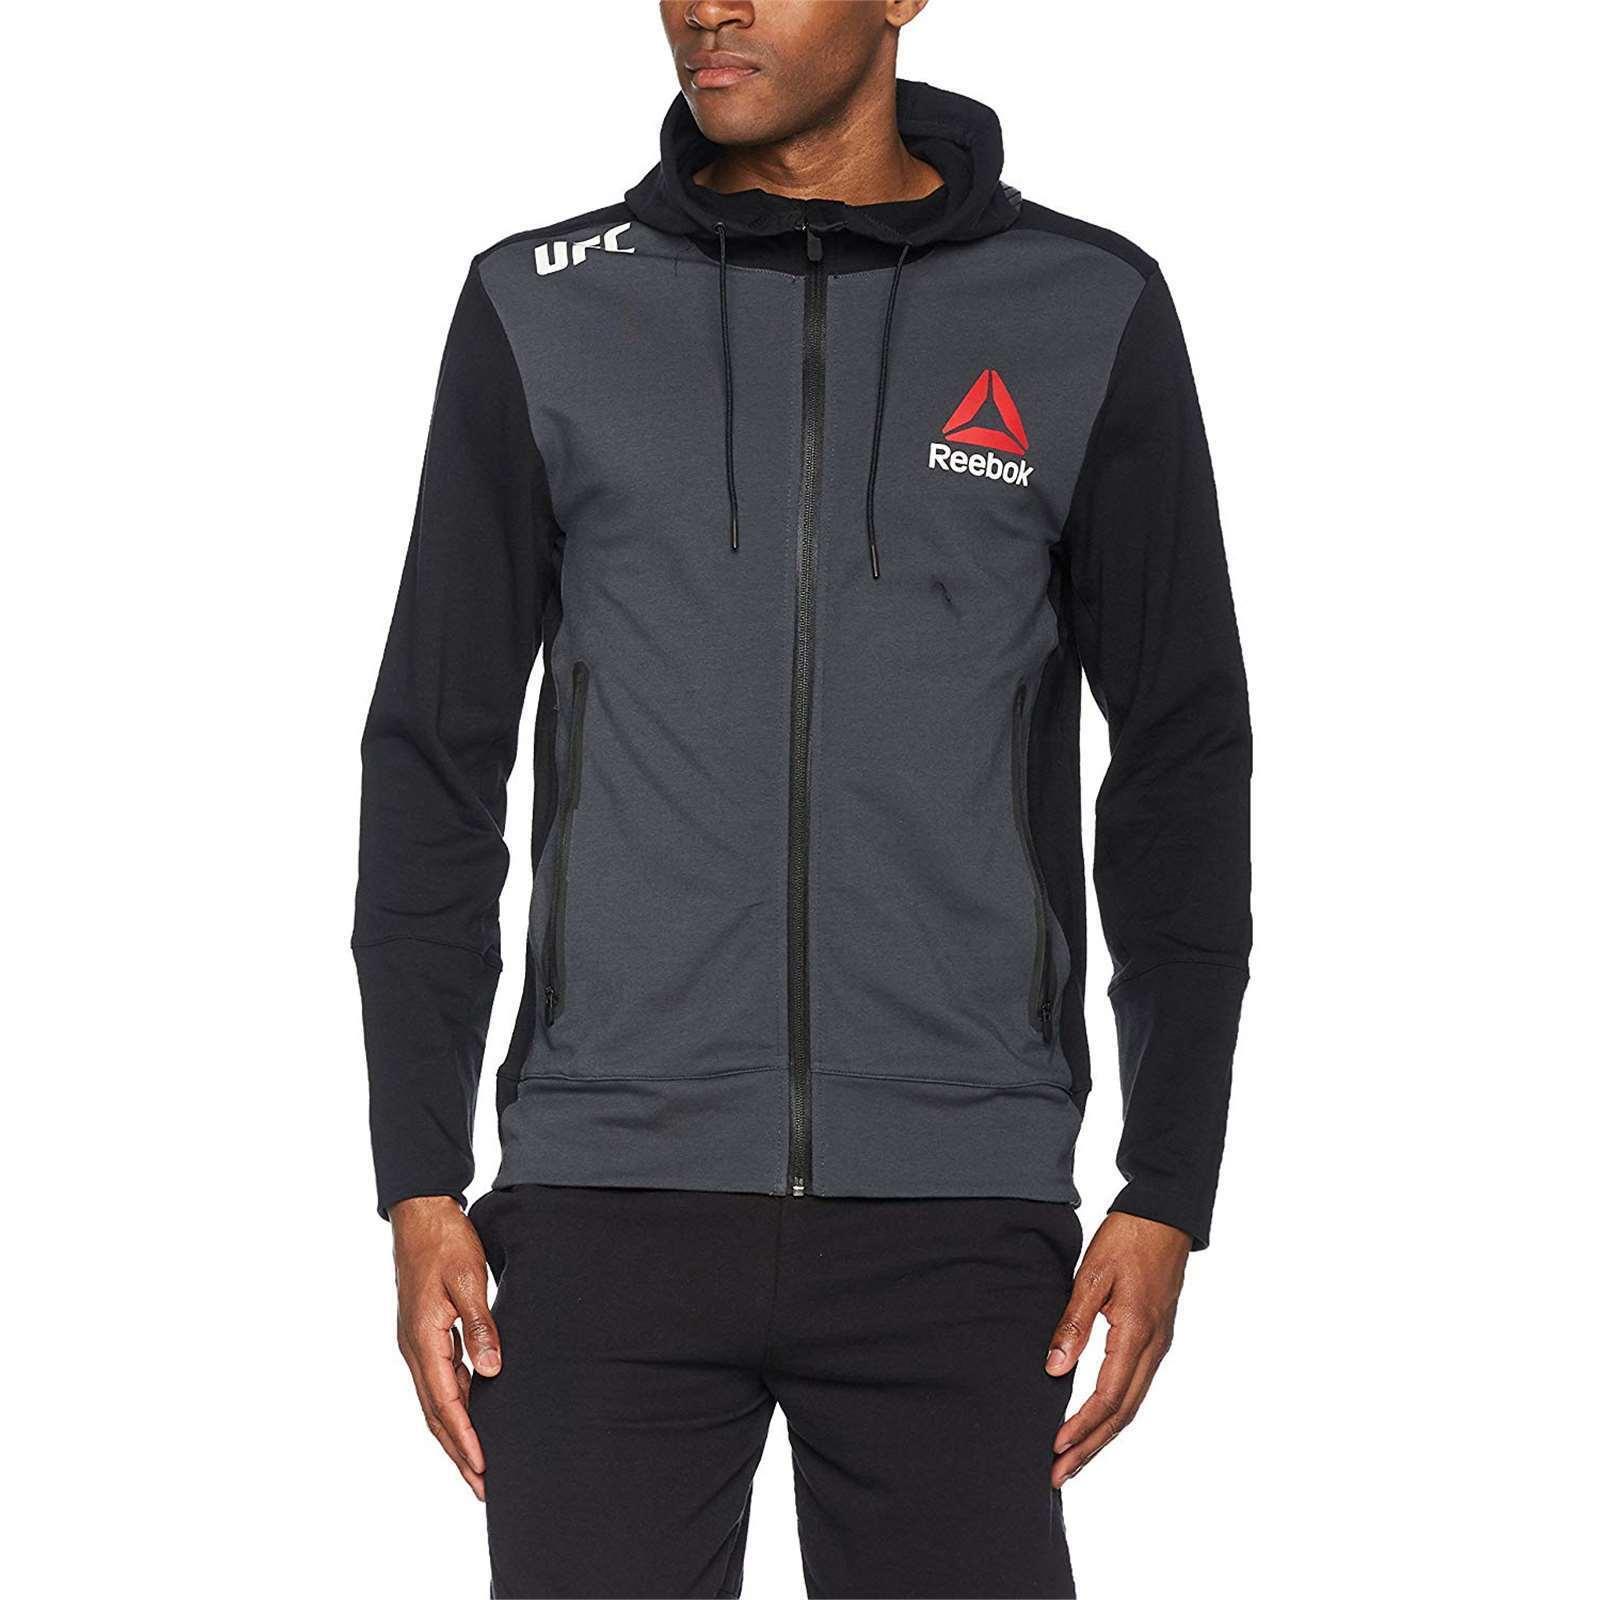 Men Adidas Originals Trefoil Pullover Hoodie White z DU7780